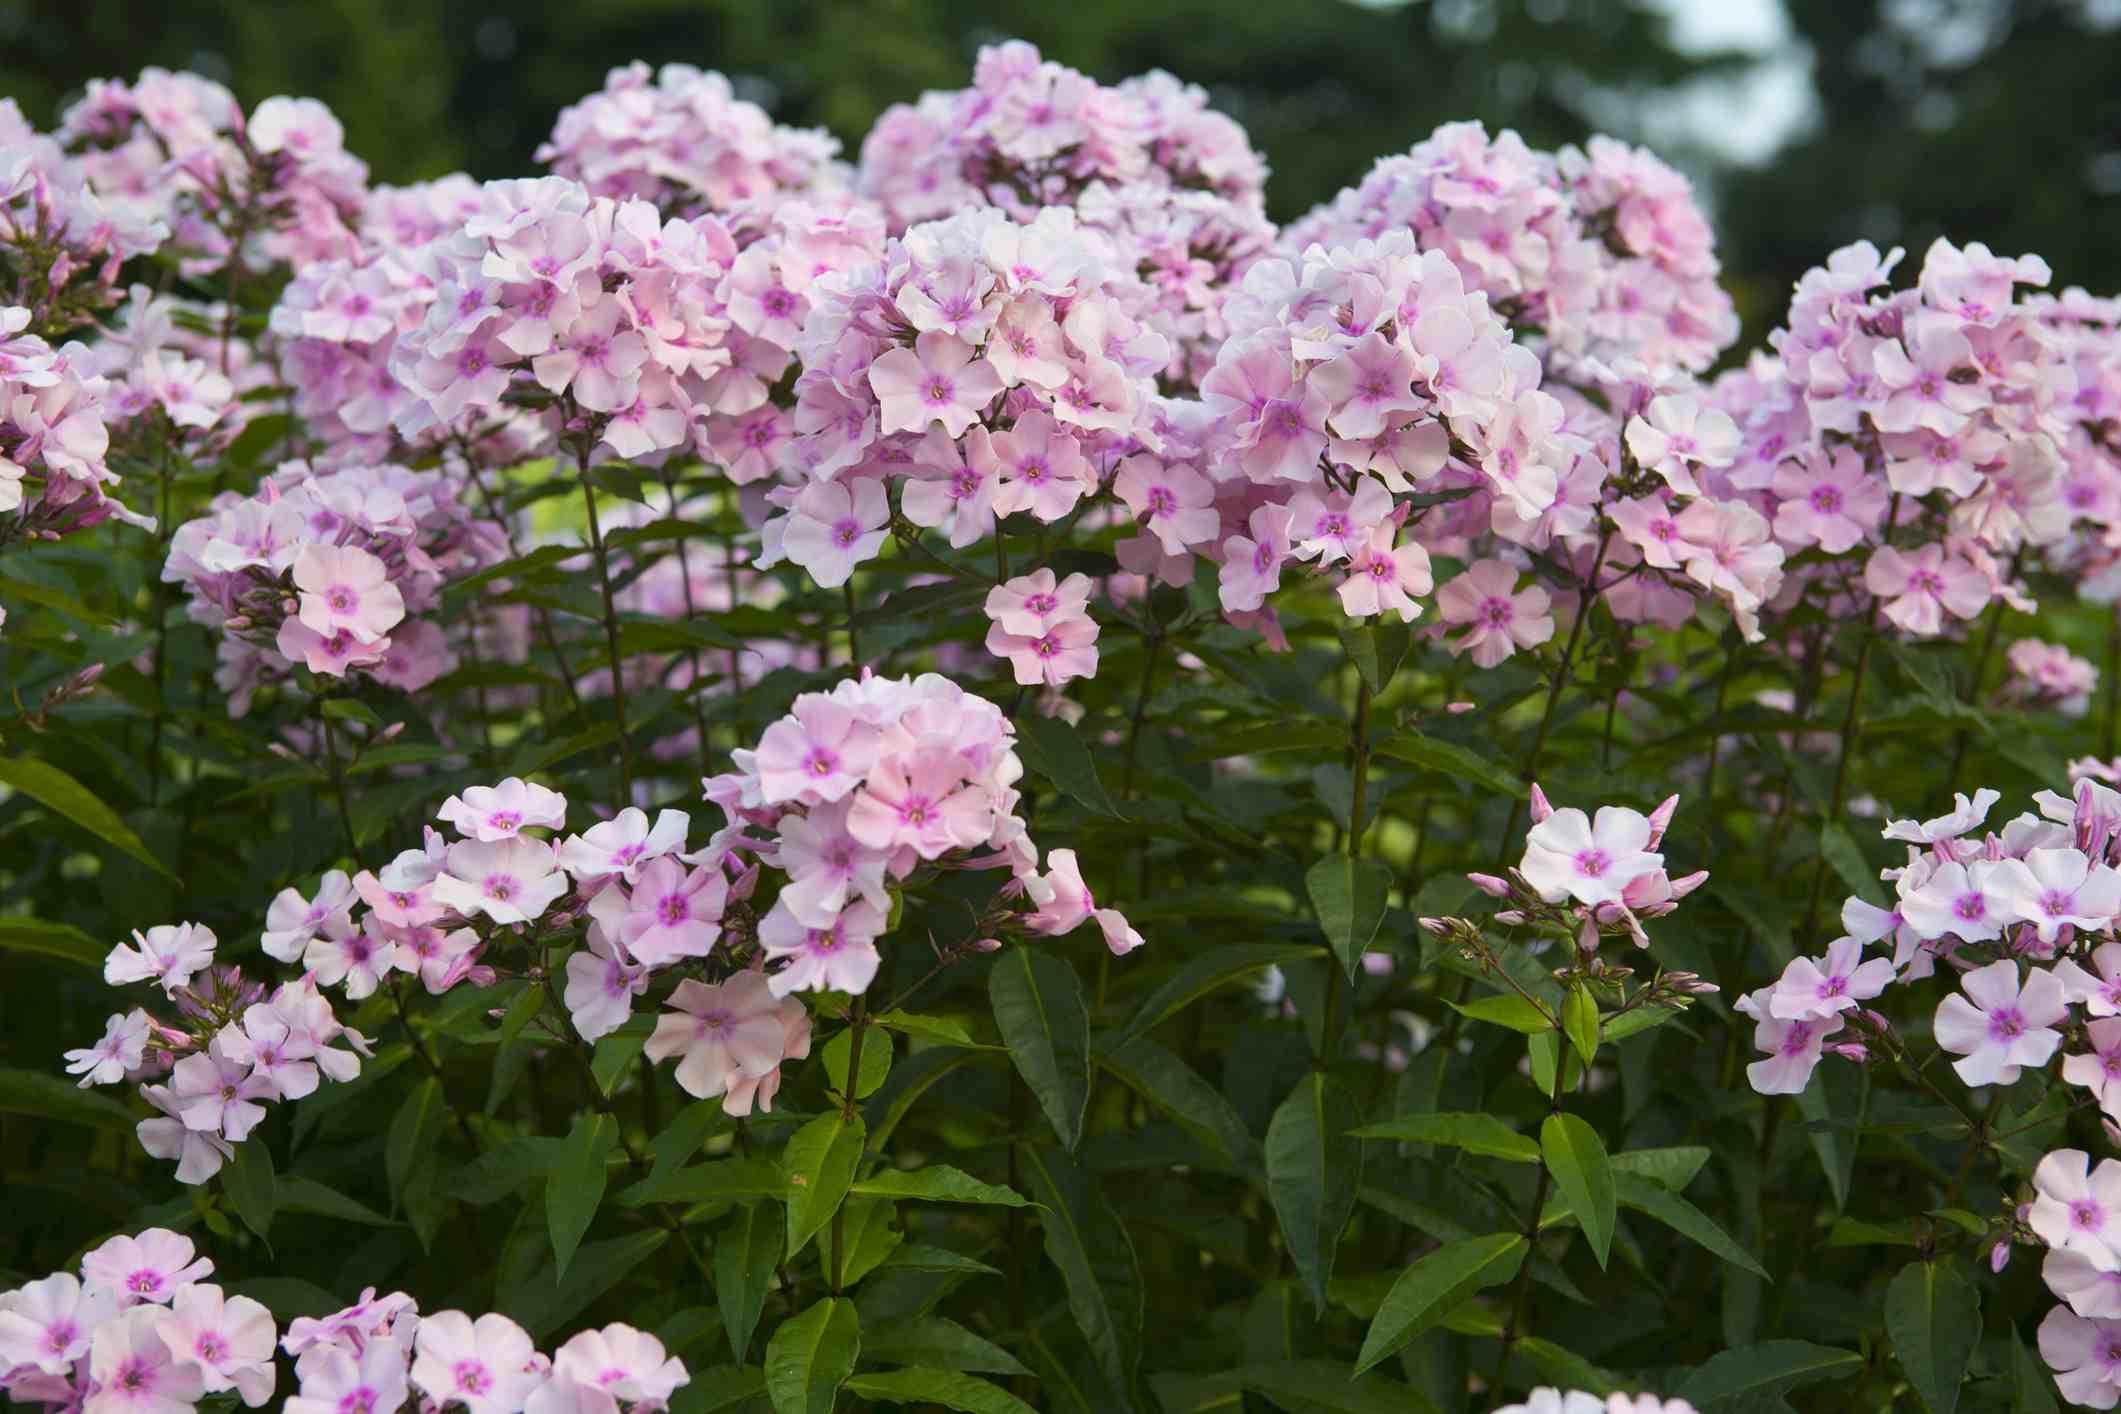 Phlox paniculata flowers